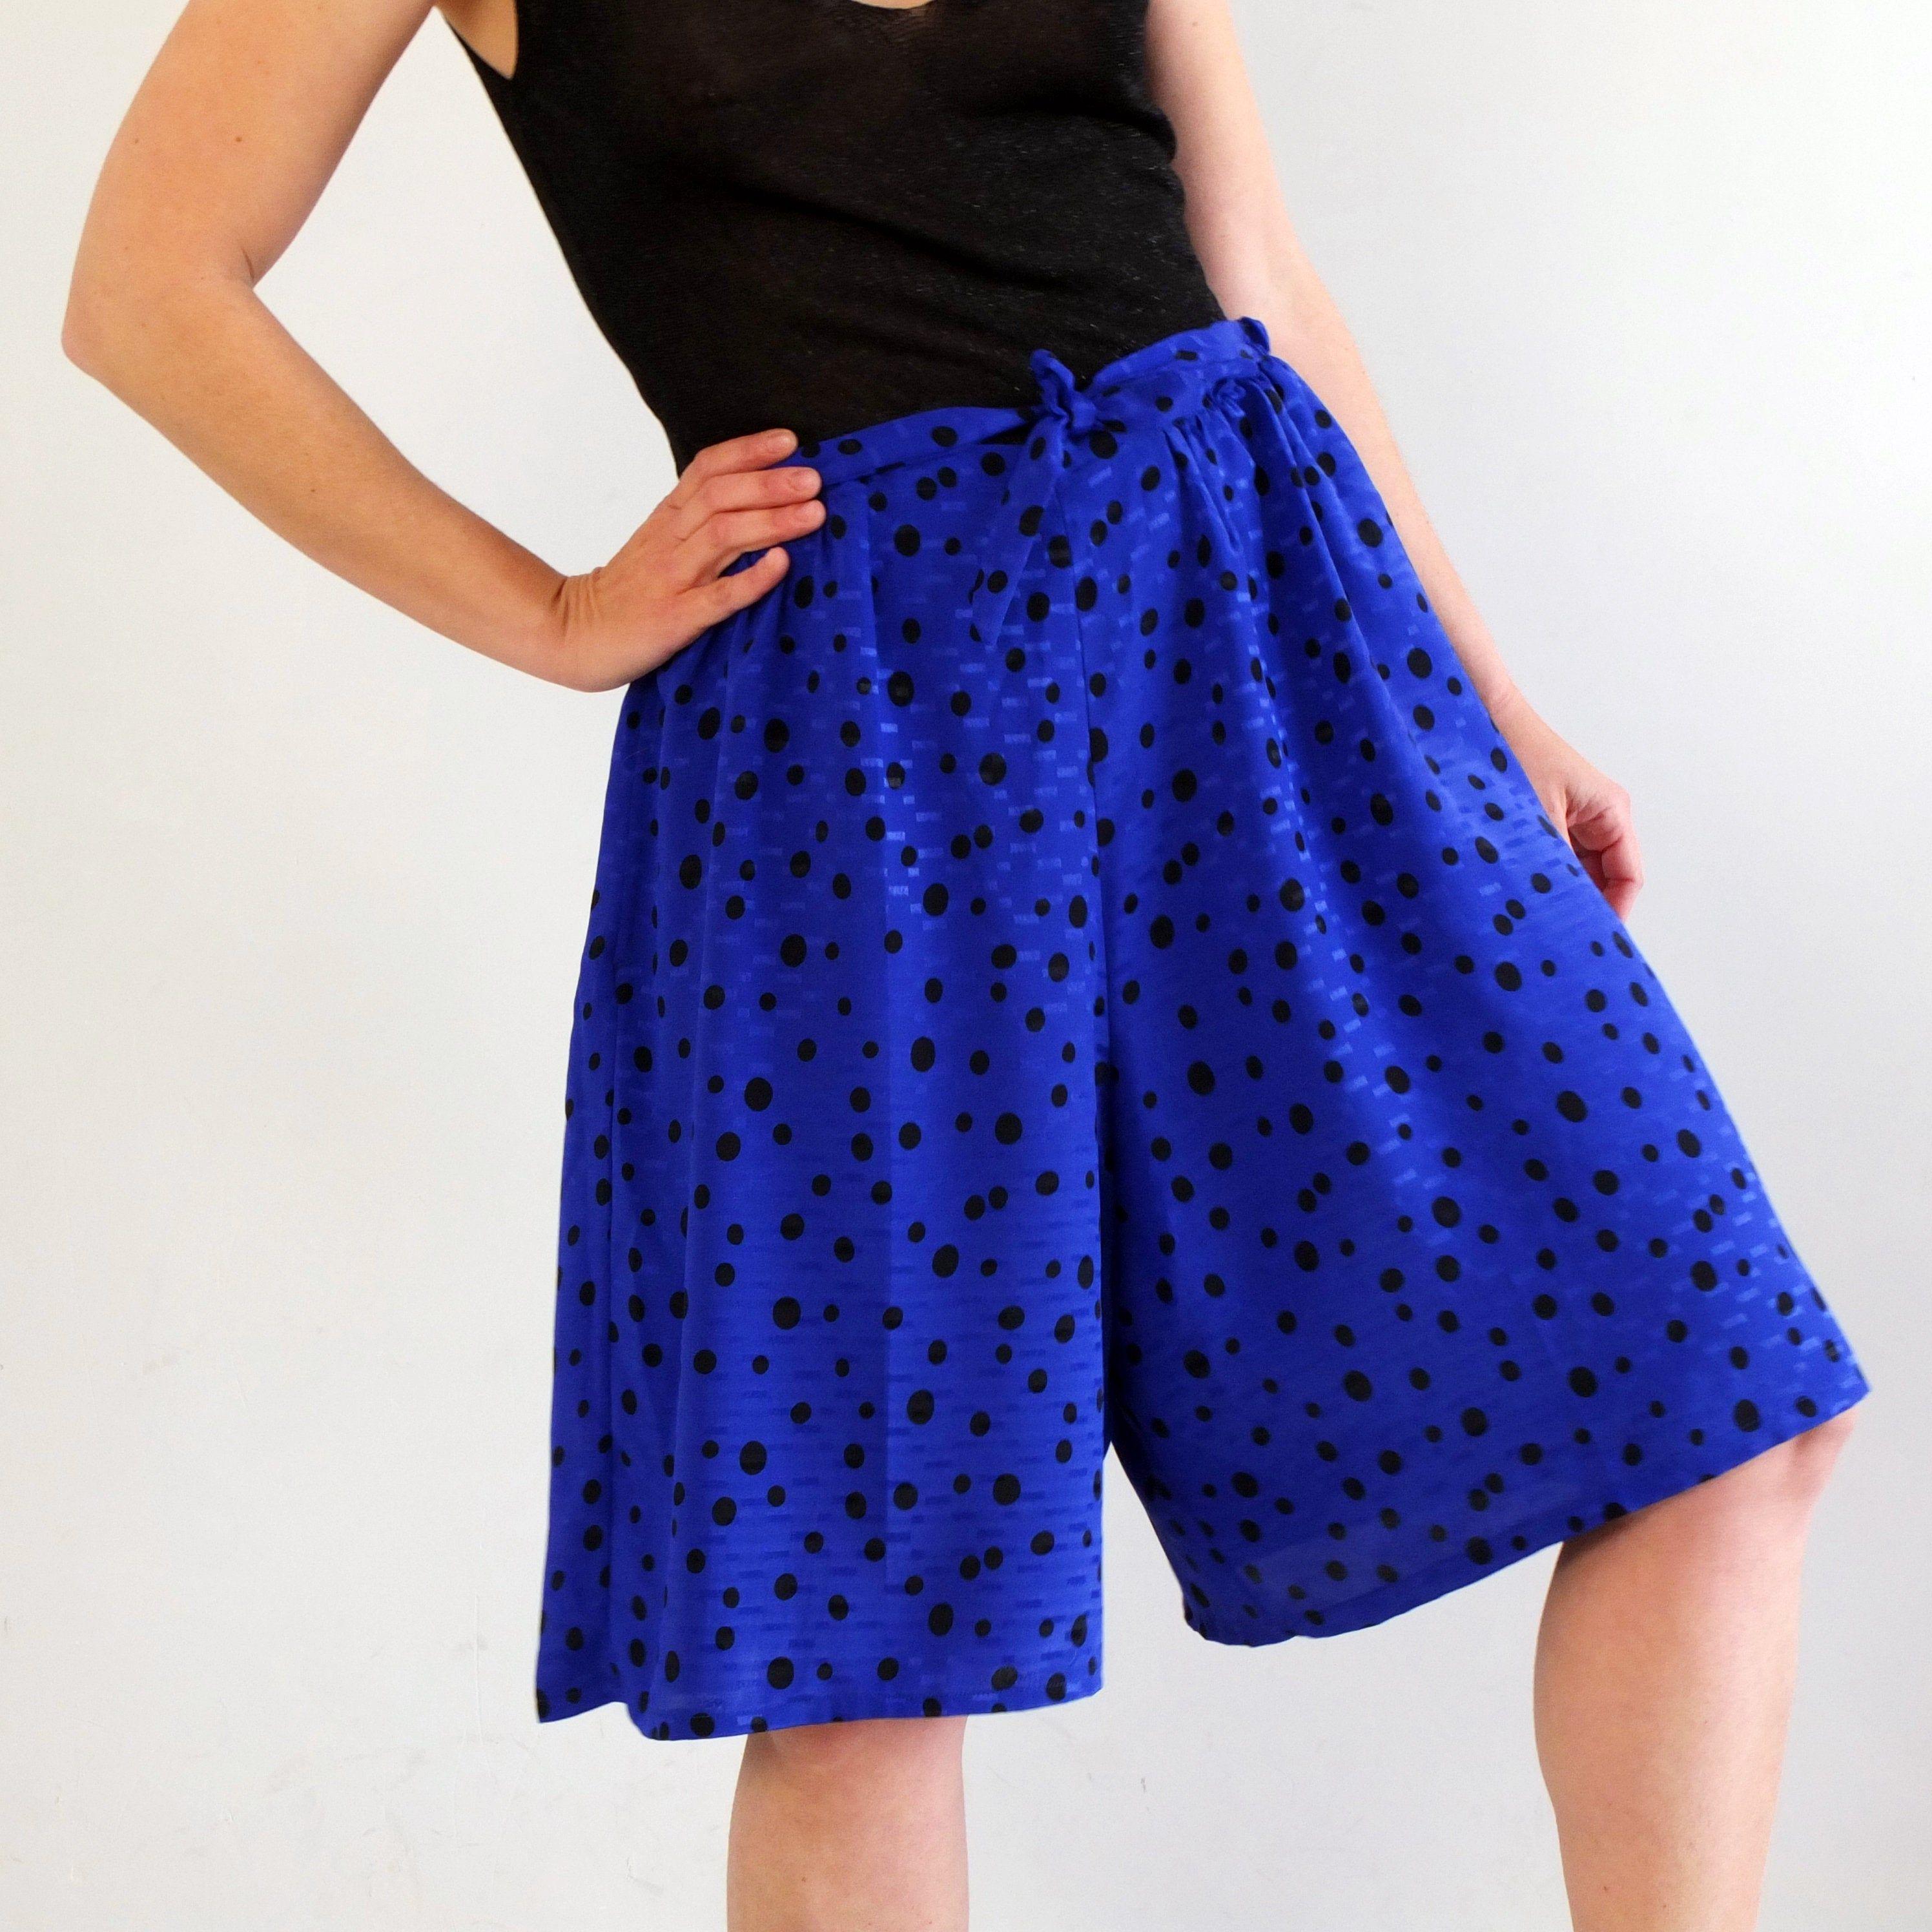 Vintage 1980s Culotte Polka Dot High Waisted Polka Dot Short size 7